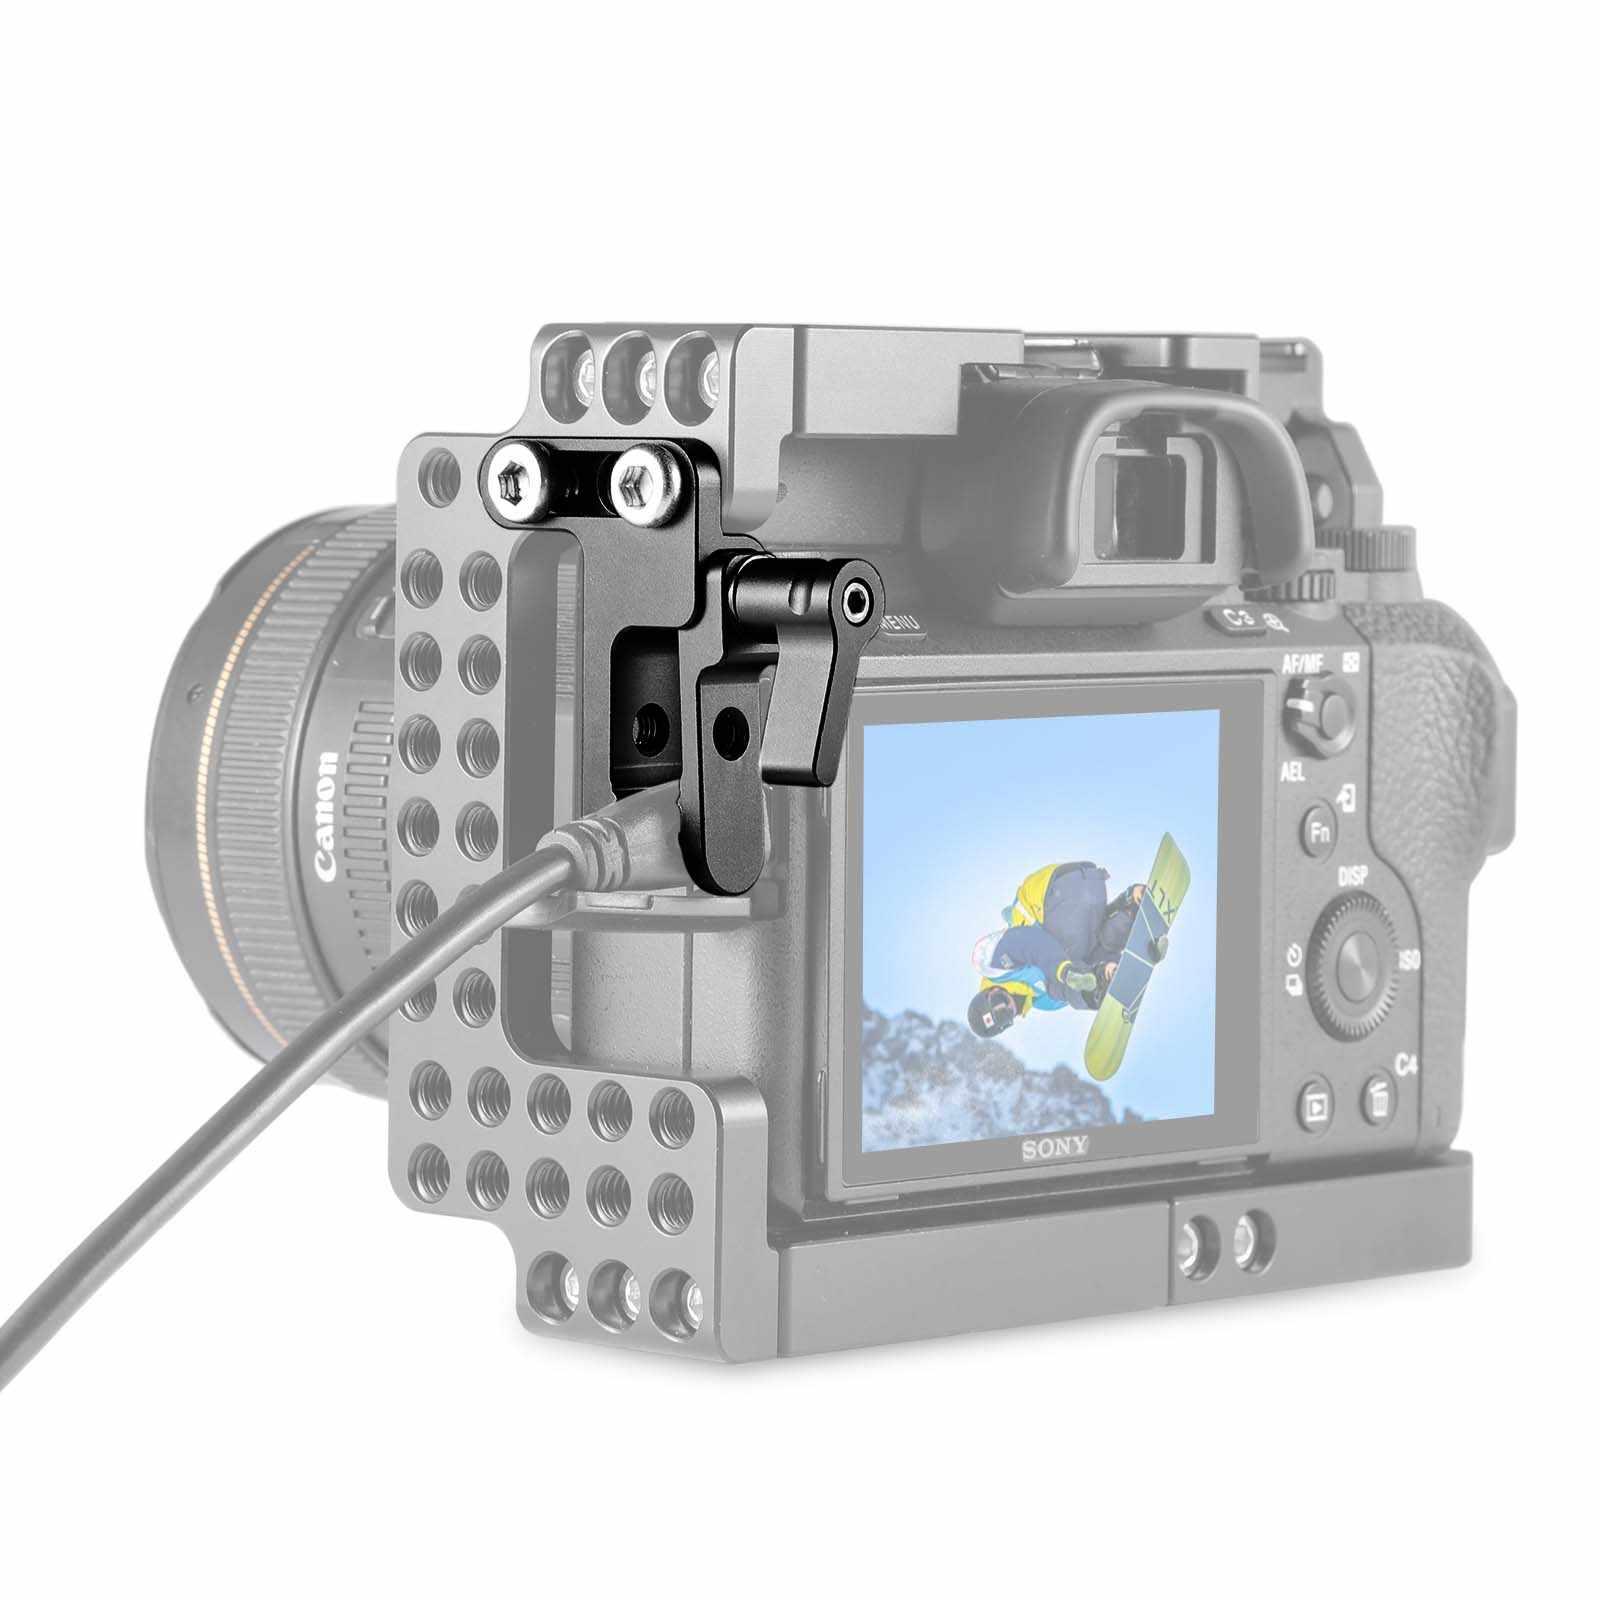 Smallrig Camera Hdmi Klem Lock Ontwikkeld Voor Sony A7ii A7III A7RIII Smallrig Kooi 1673,1675 En 1660 2087 - 1679